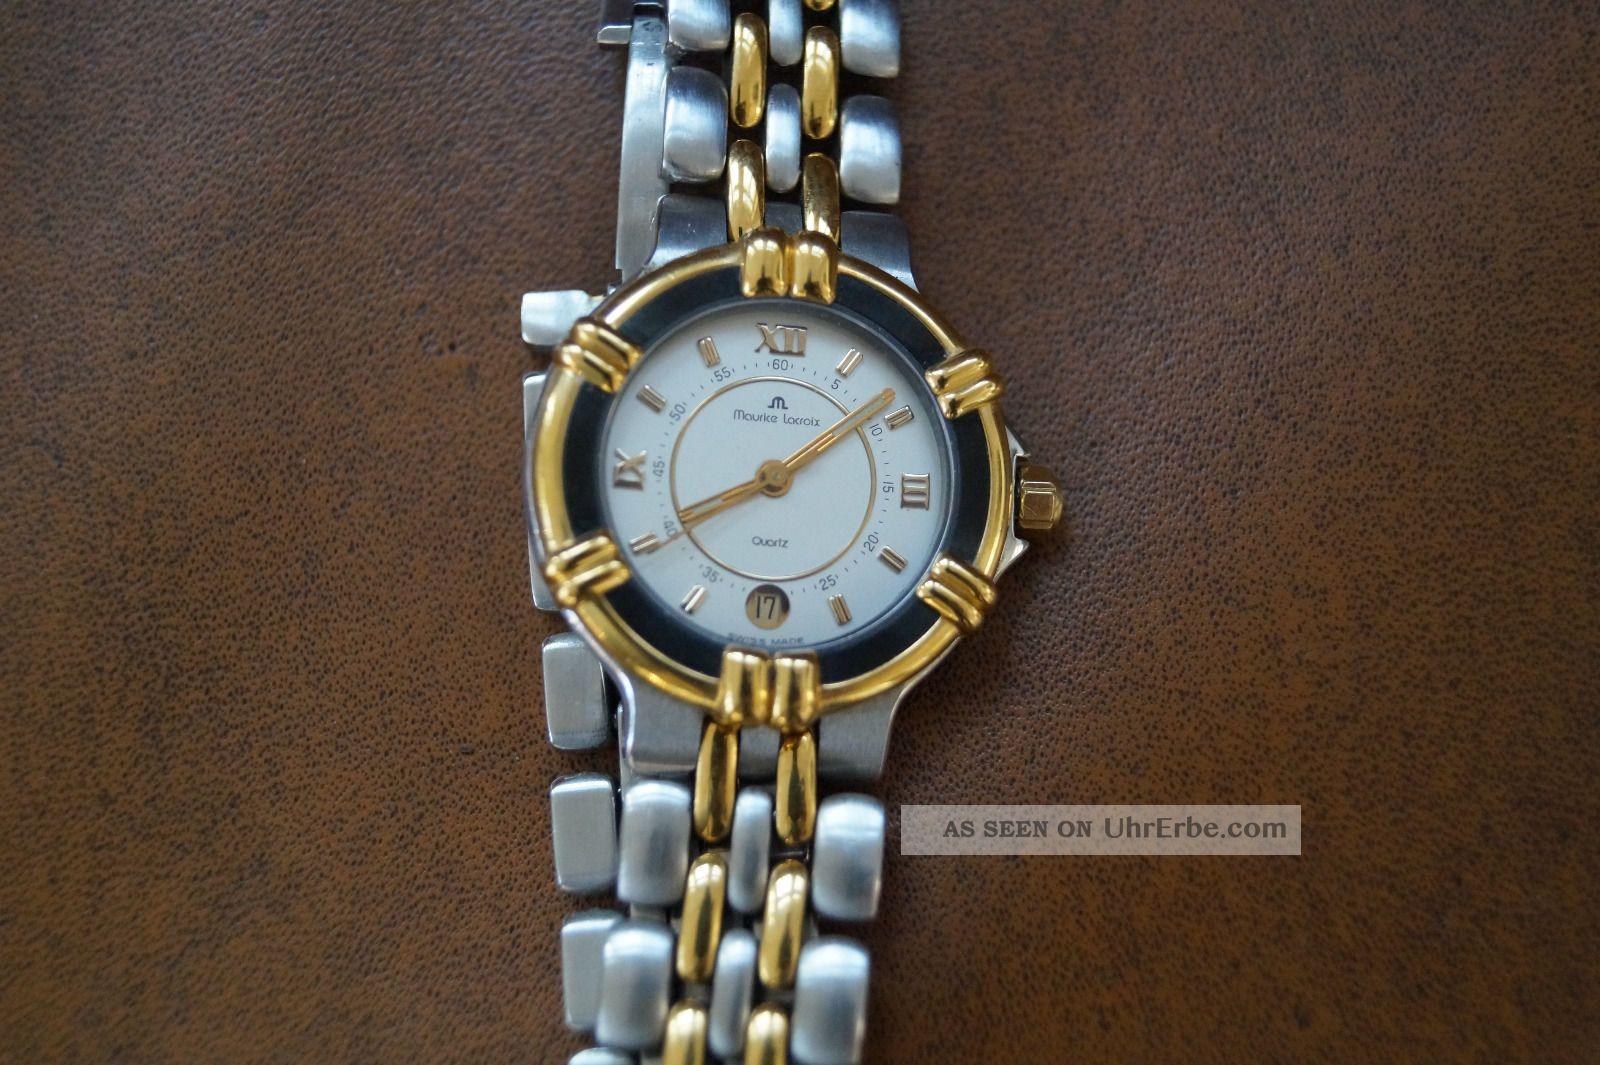 Maurice Lacroix Damenuhr Calypso Stahl/gold Quartz Perlmuttzifferblatt Armbanduhren Bild